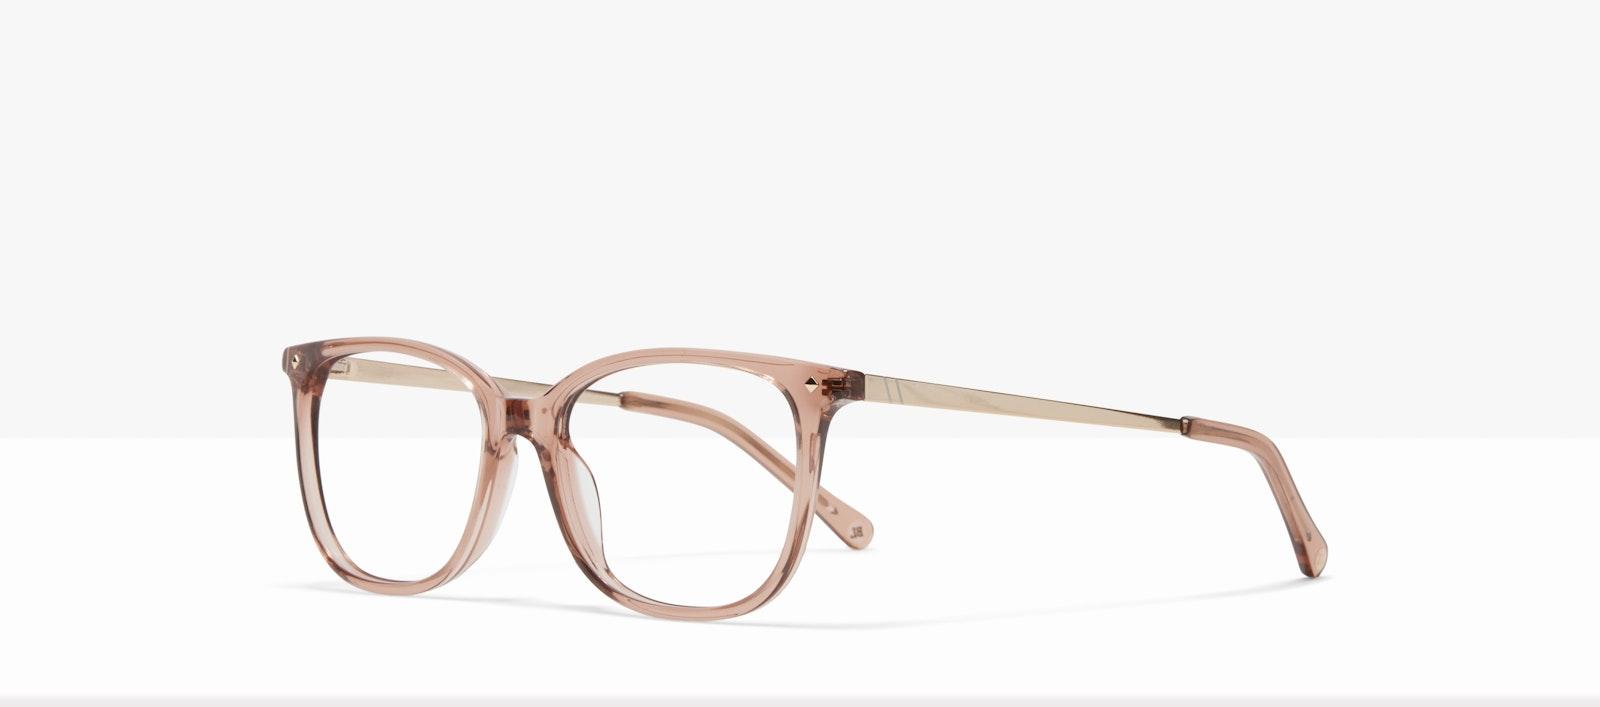 Affordable Fashion Glasses Rectangle Square Eyeglasses Women Refine S Rose Tilt